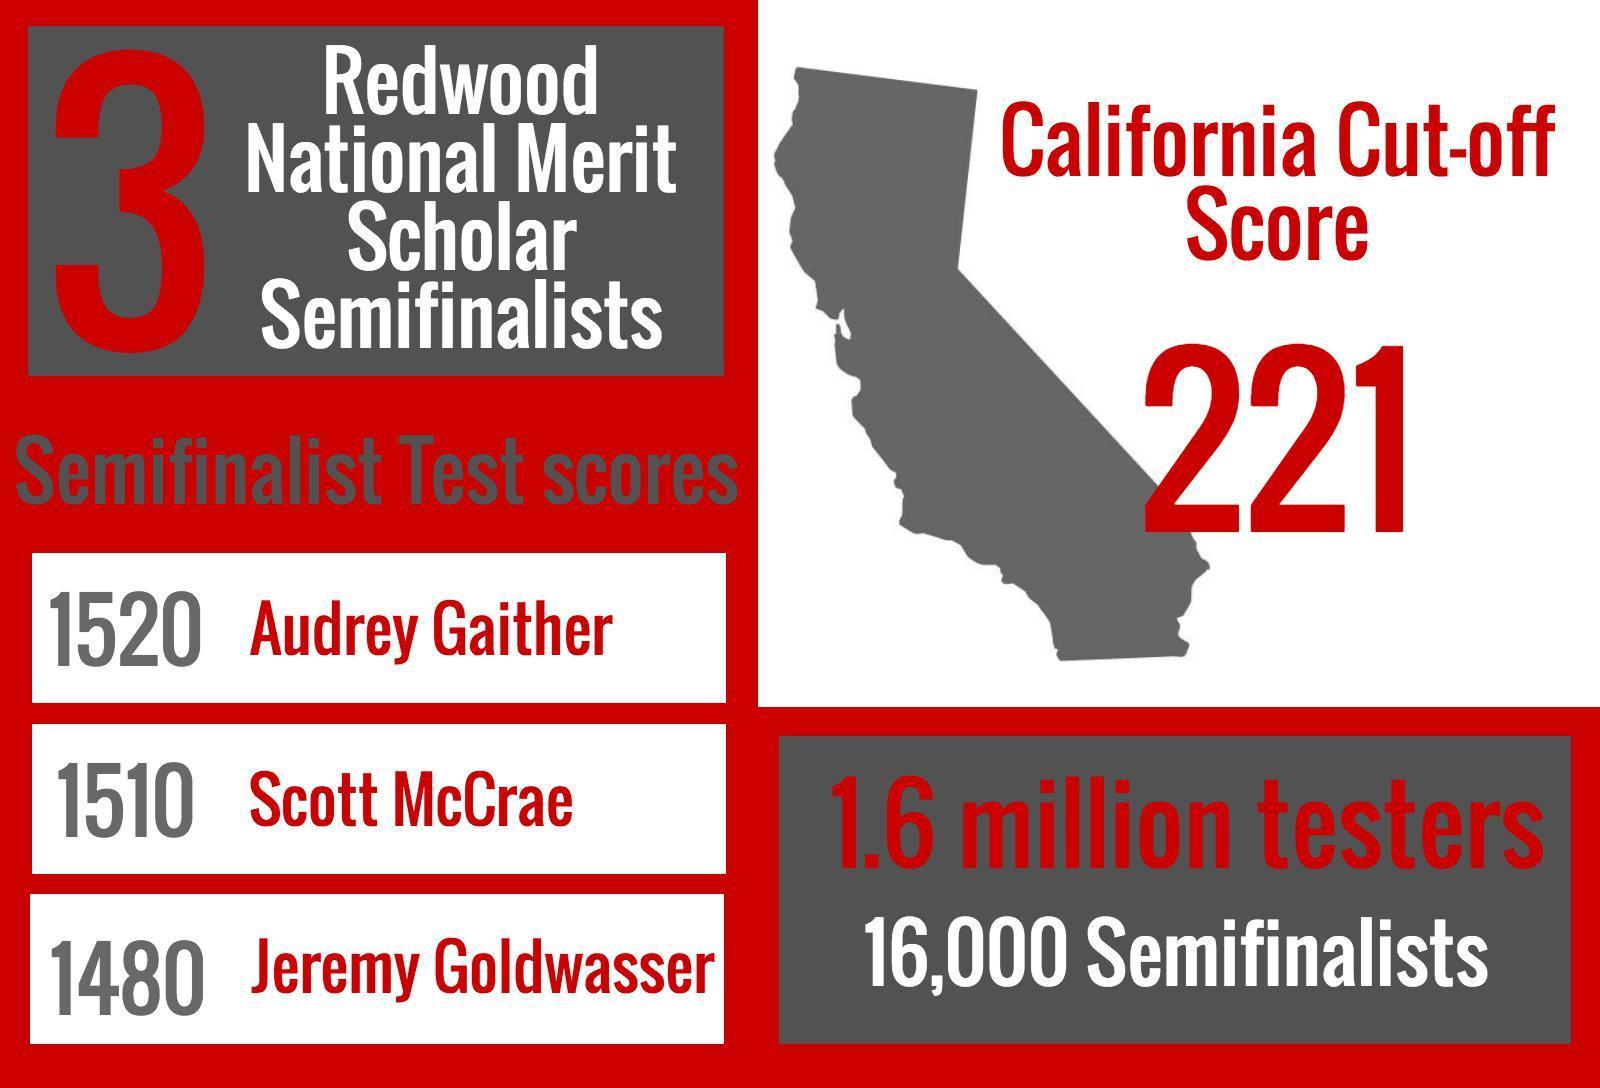 Three Redwood seniors named National Merit Scholar Semifinalists